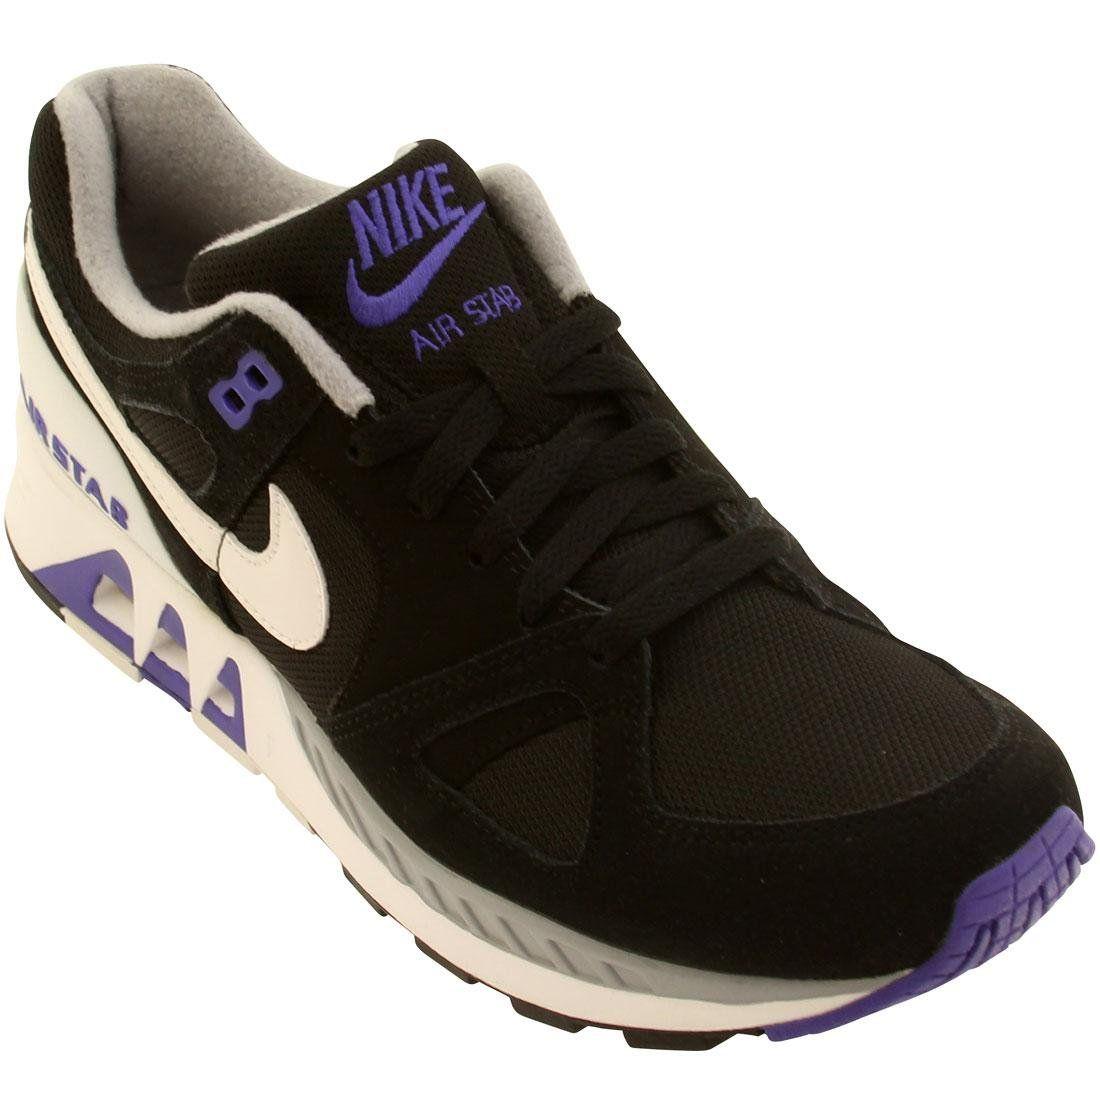 Nike Air Stab Mens Running Shoes 312451-005 Black White-Persian Violet 10.5  M 4ee7c380ab